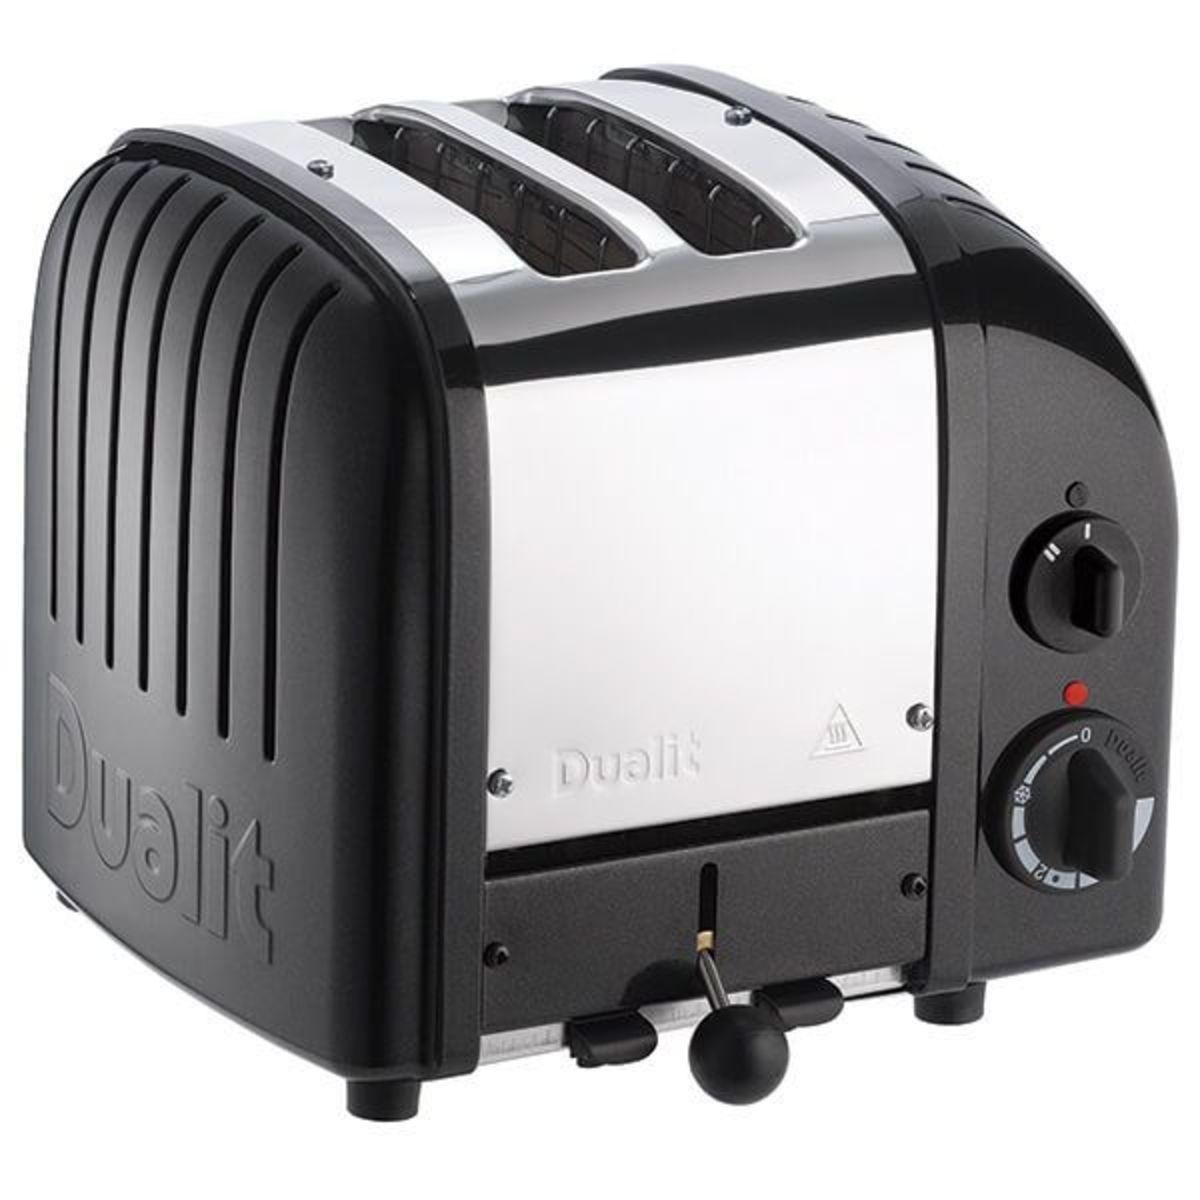 Image of Dualit 20433 Classic Vario AWS 2 Slot Toaster, Satin Black